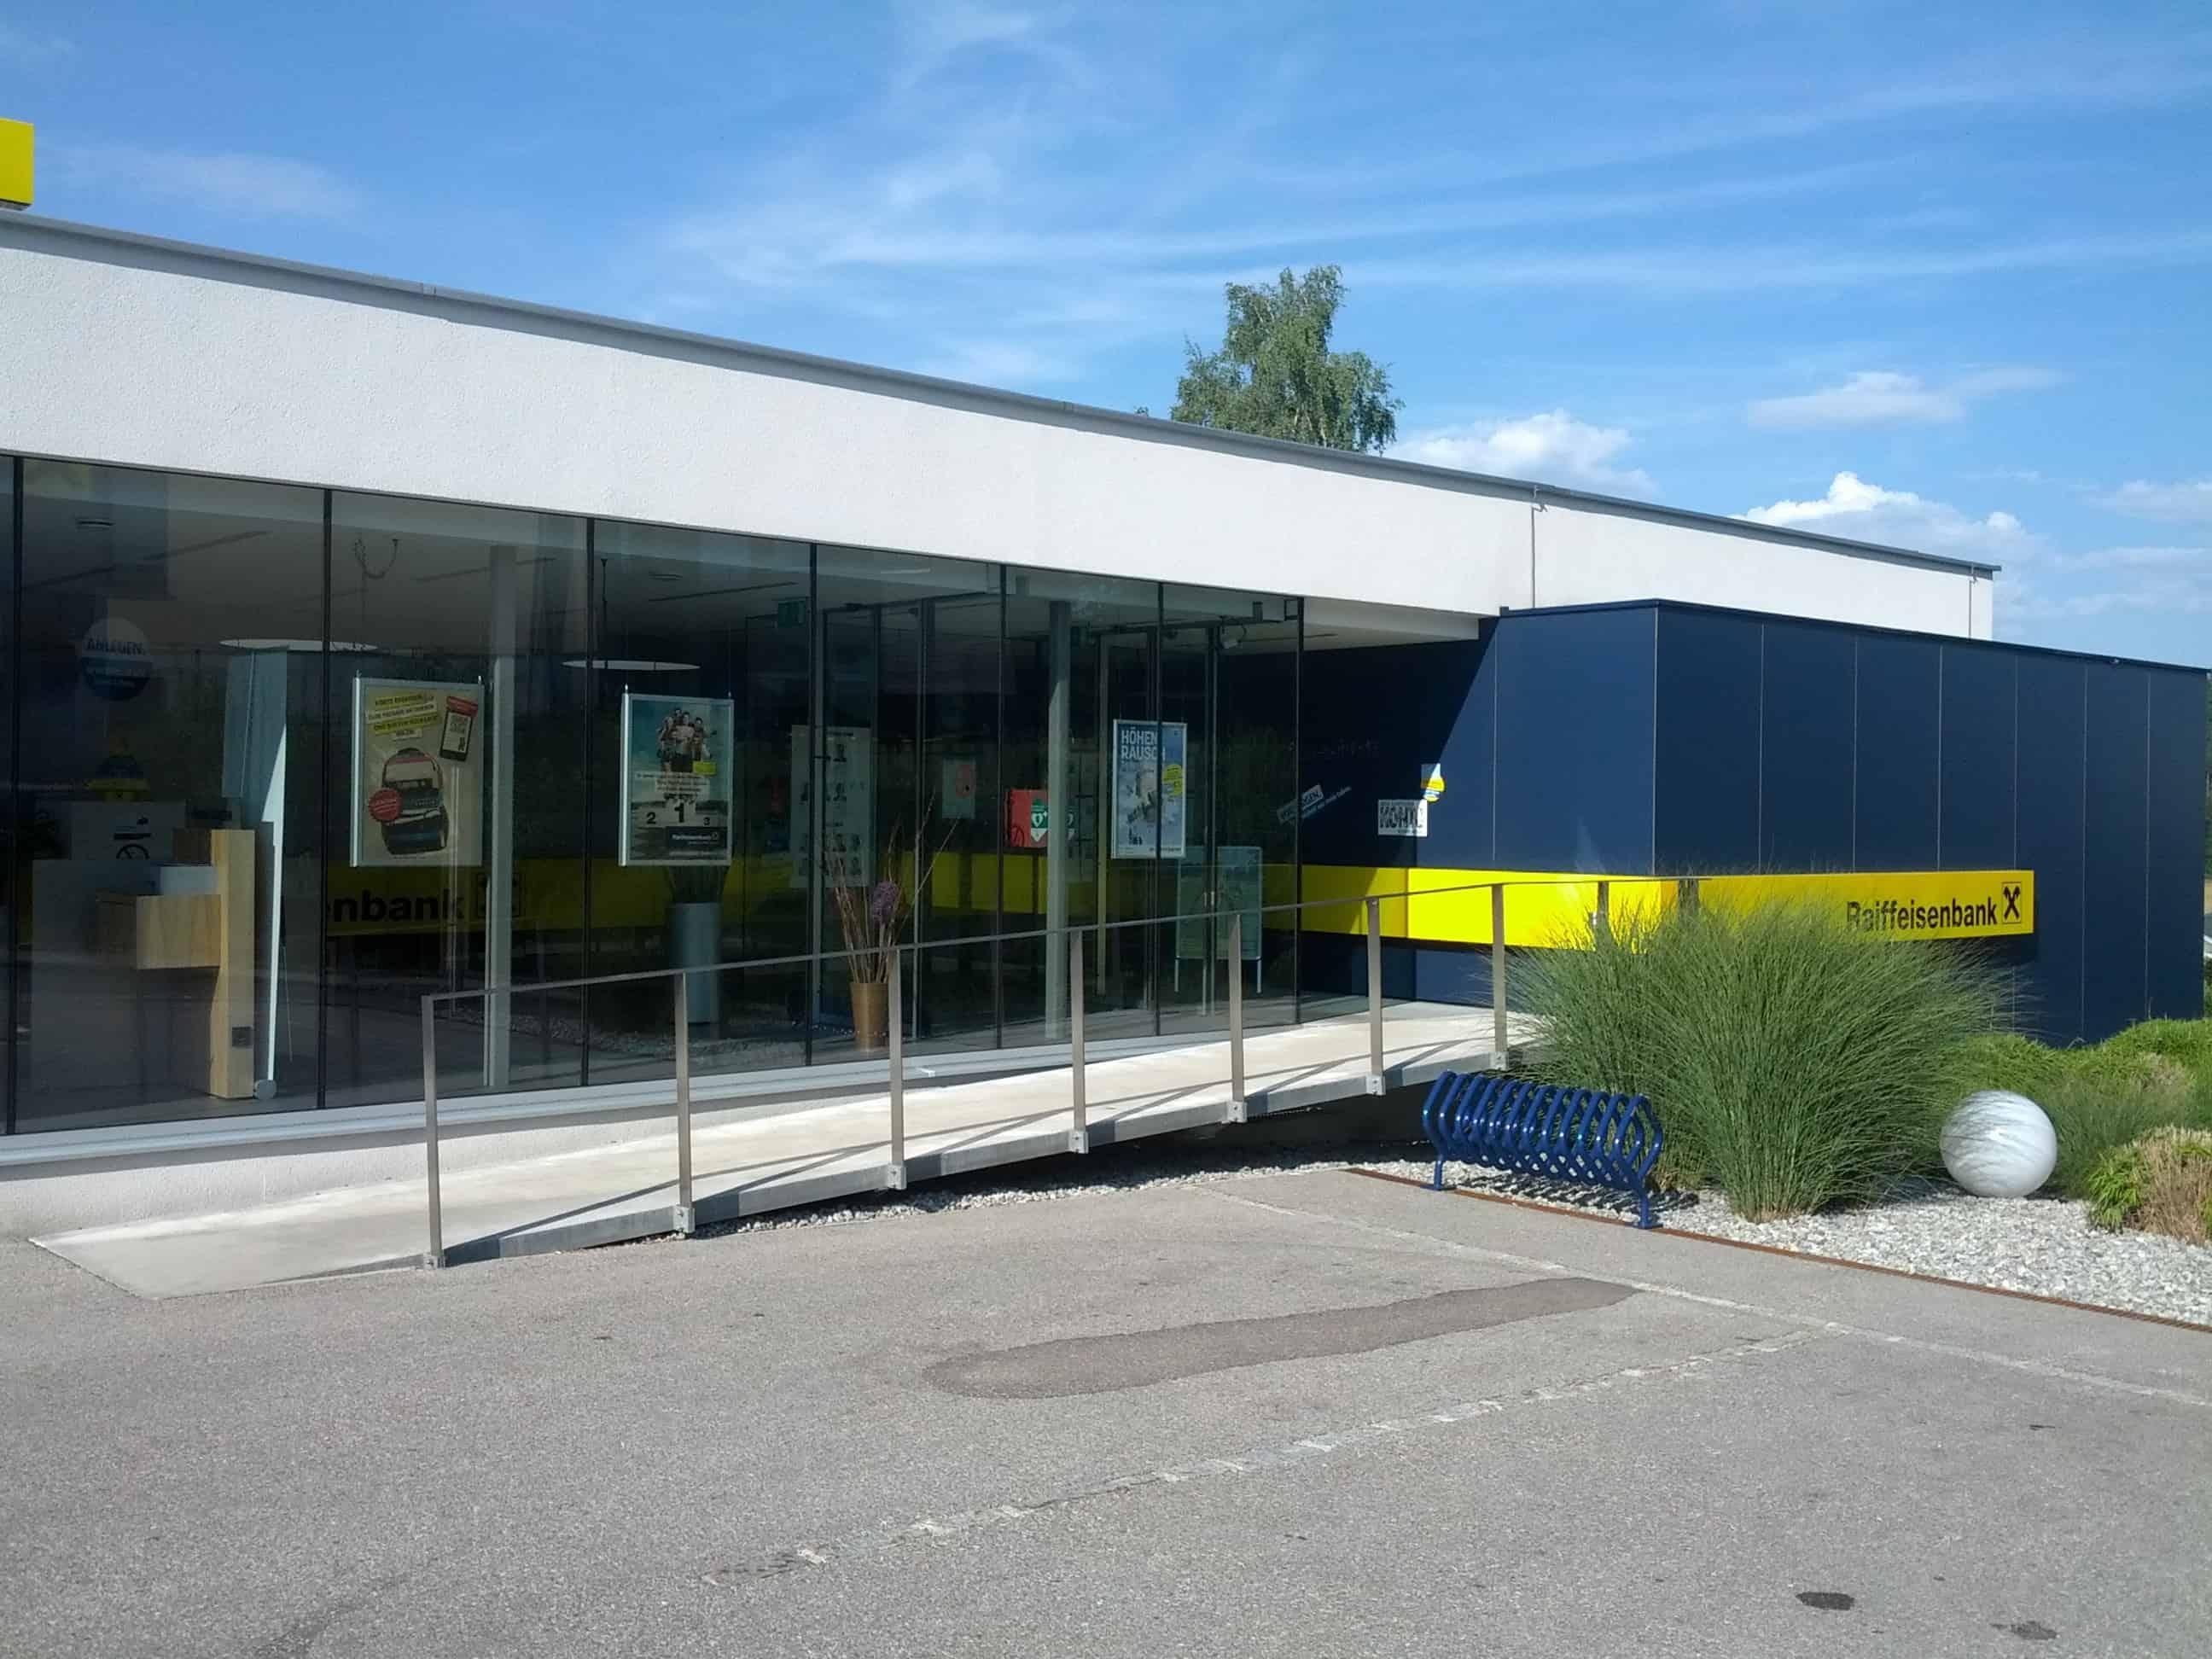 Raiffeisenbank Region Pregarten reg. Gen. m. b. H. Bst. St. Leonhard